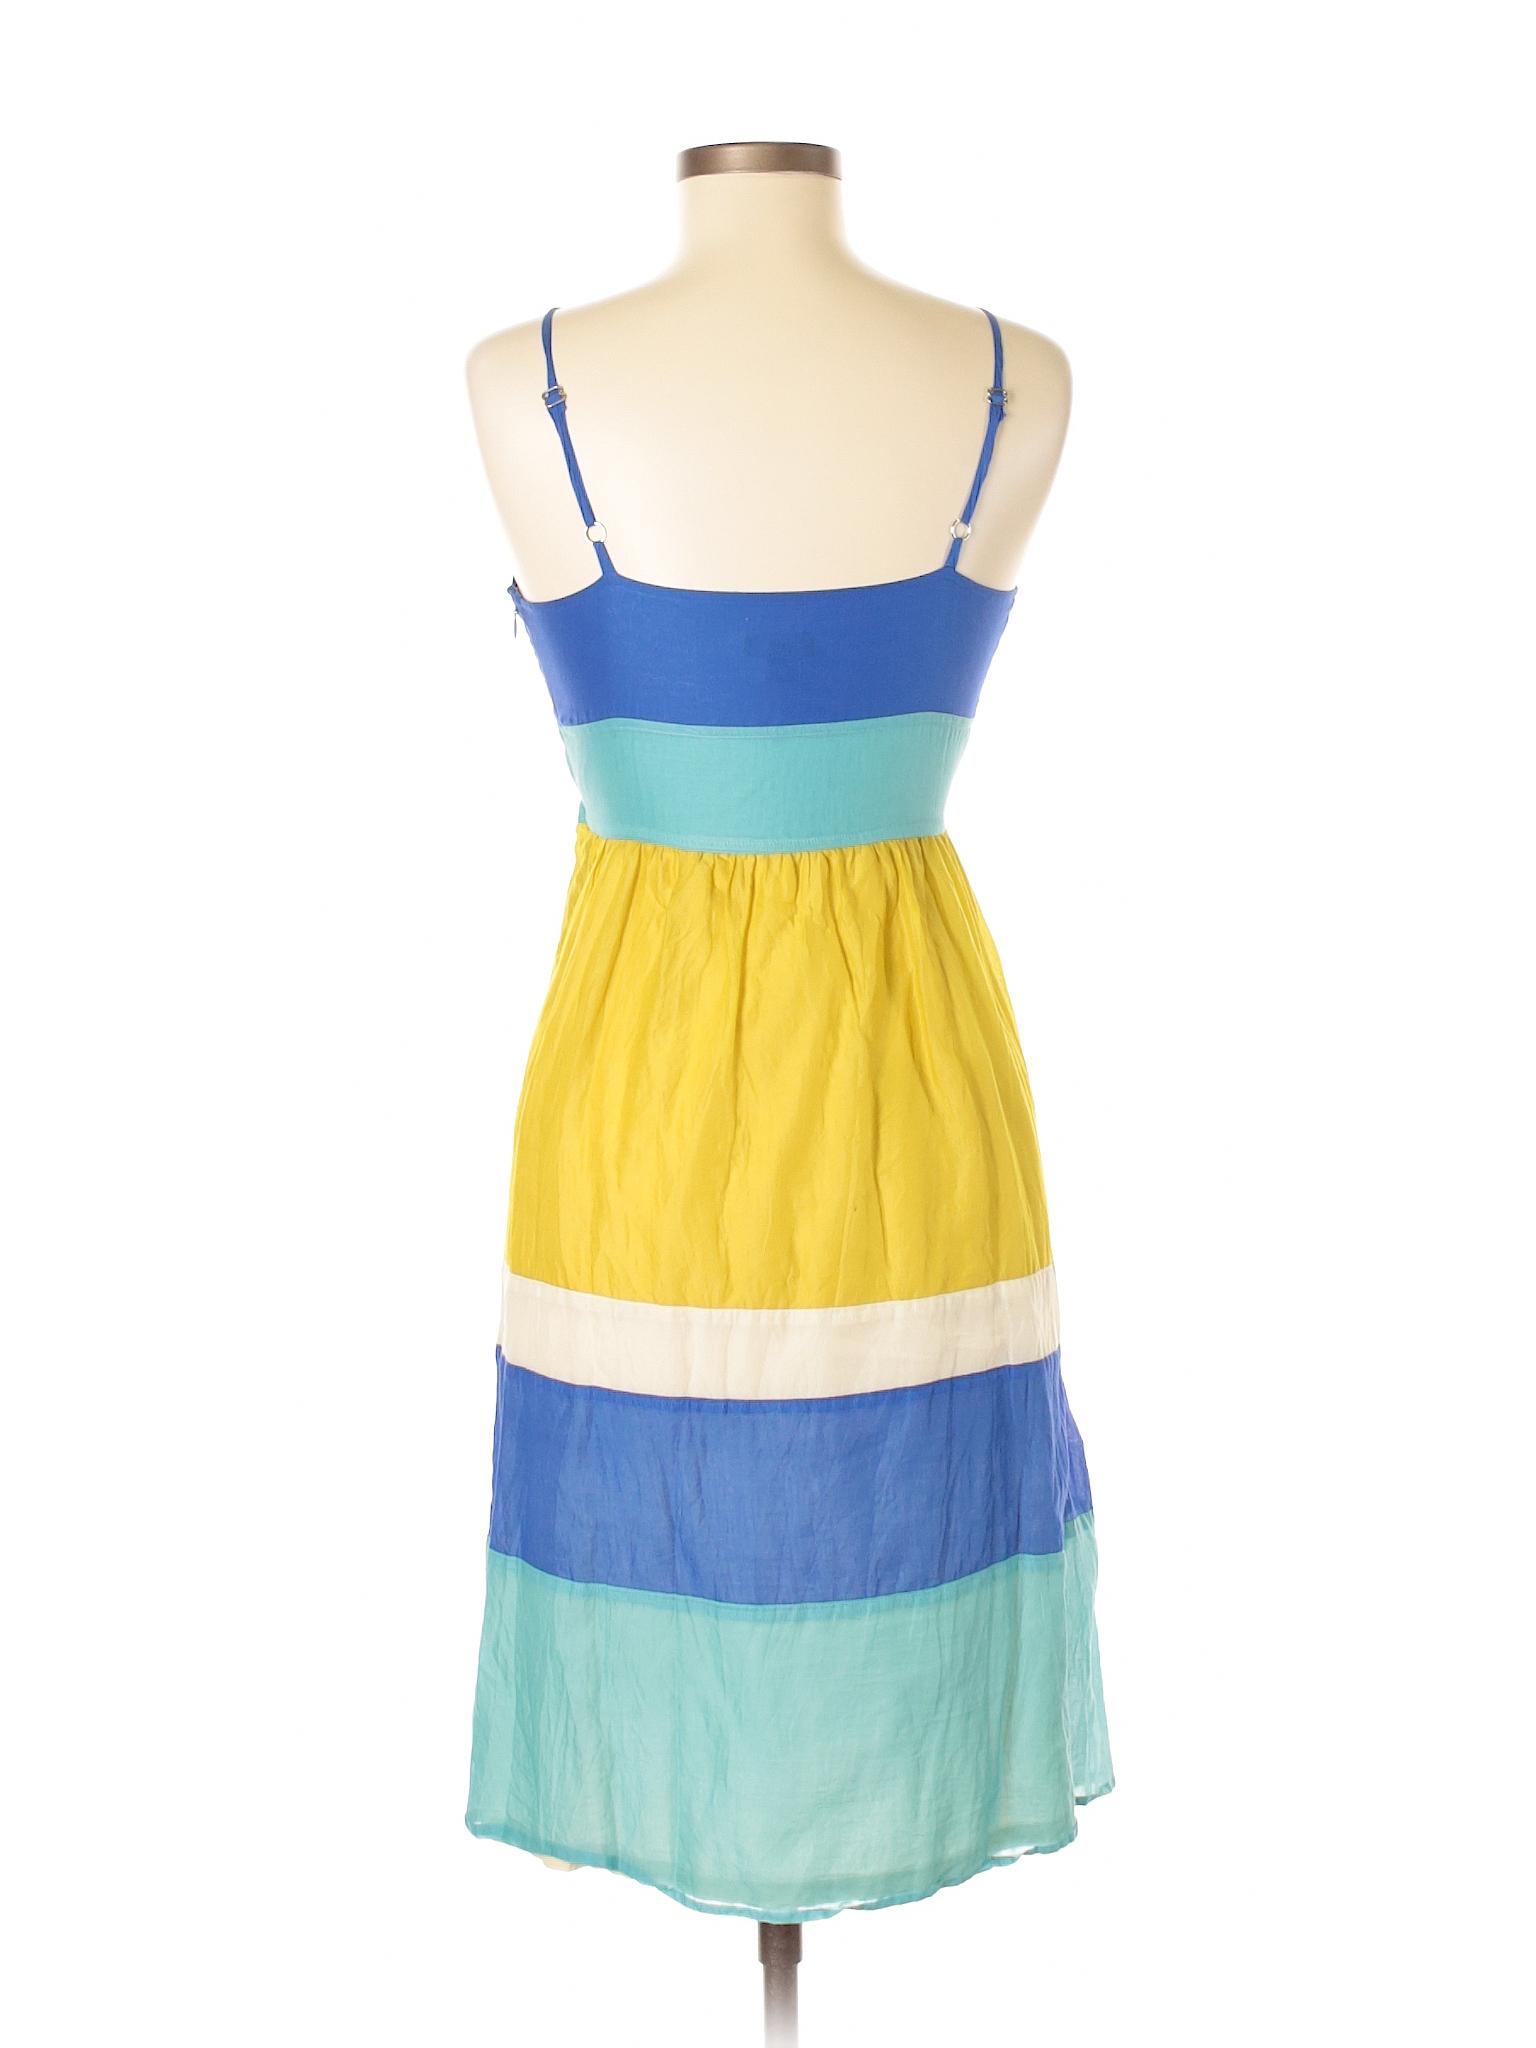 Dress Casual Talbots Dress Talbots Selling Casual Selling 550qgxw